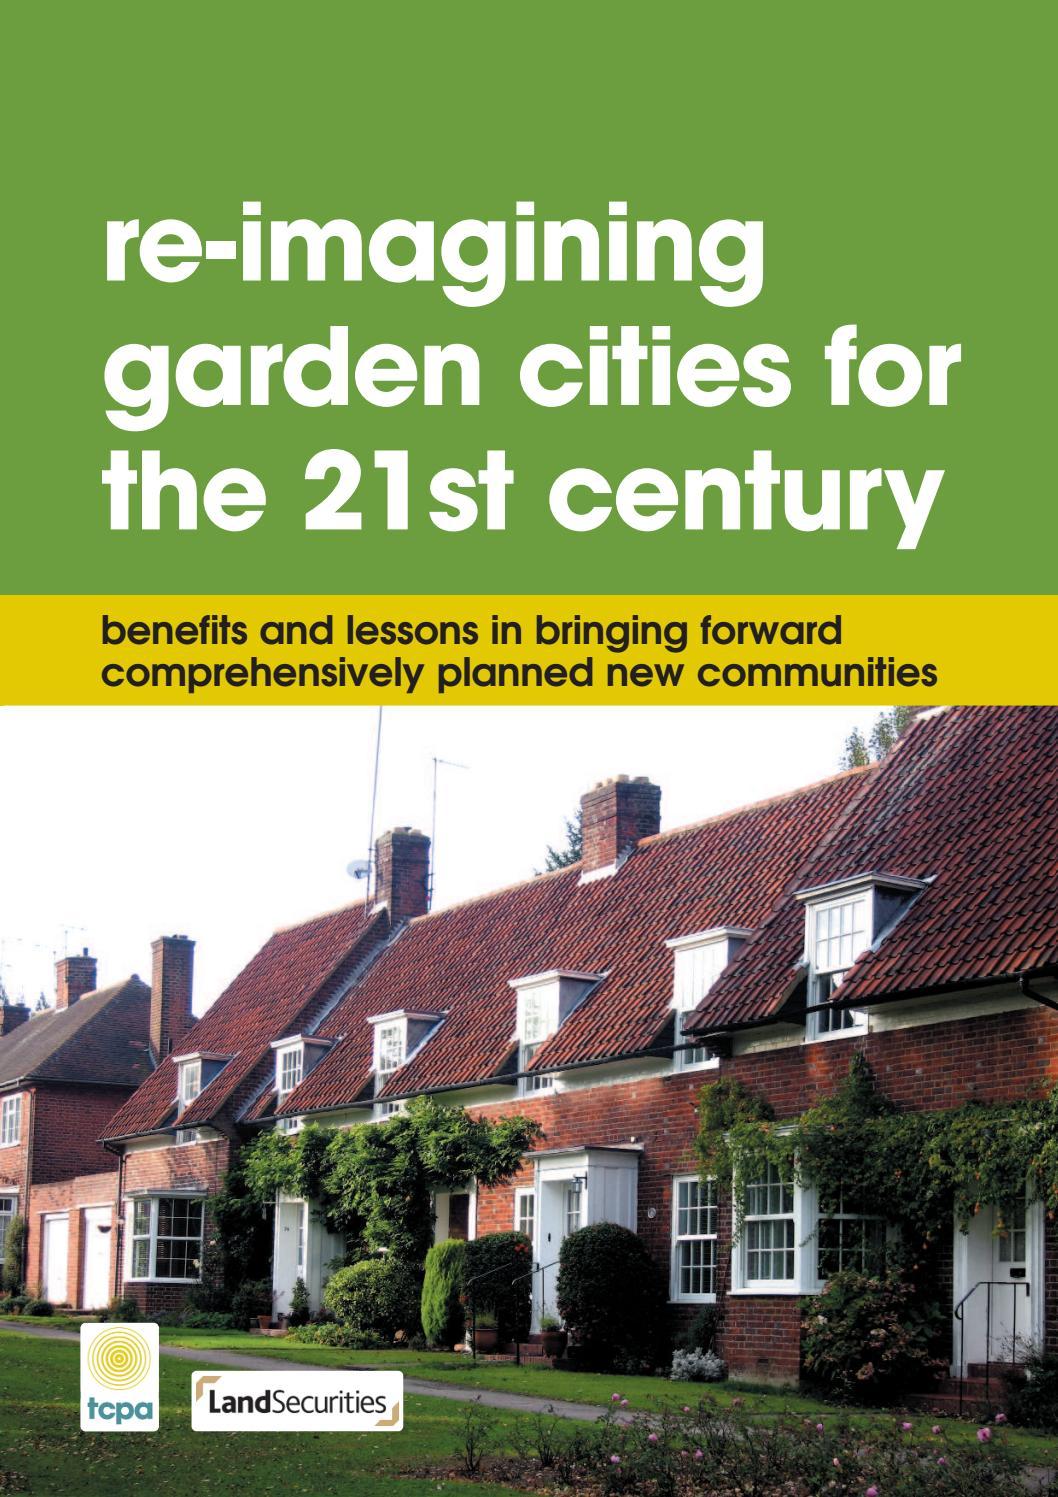 Re-imagining Garden Cities for the 21st Century: Benefits